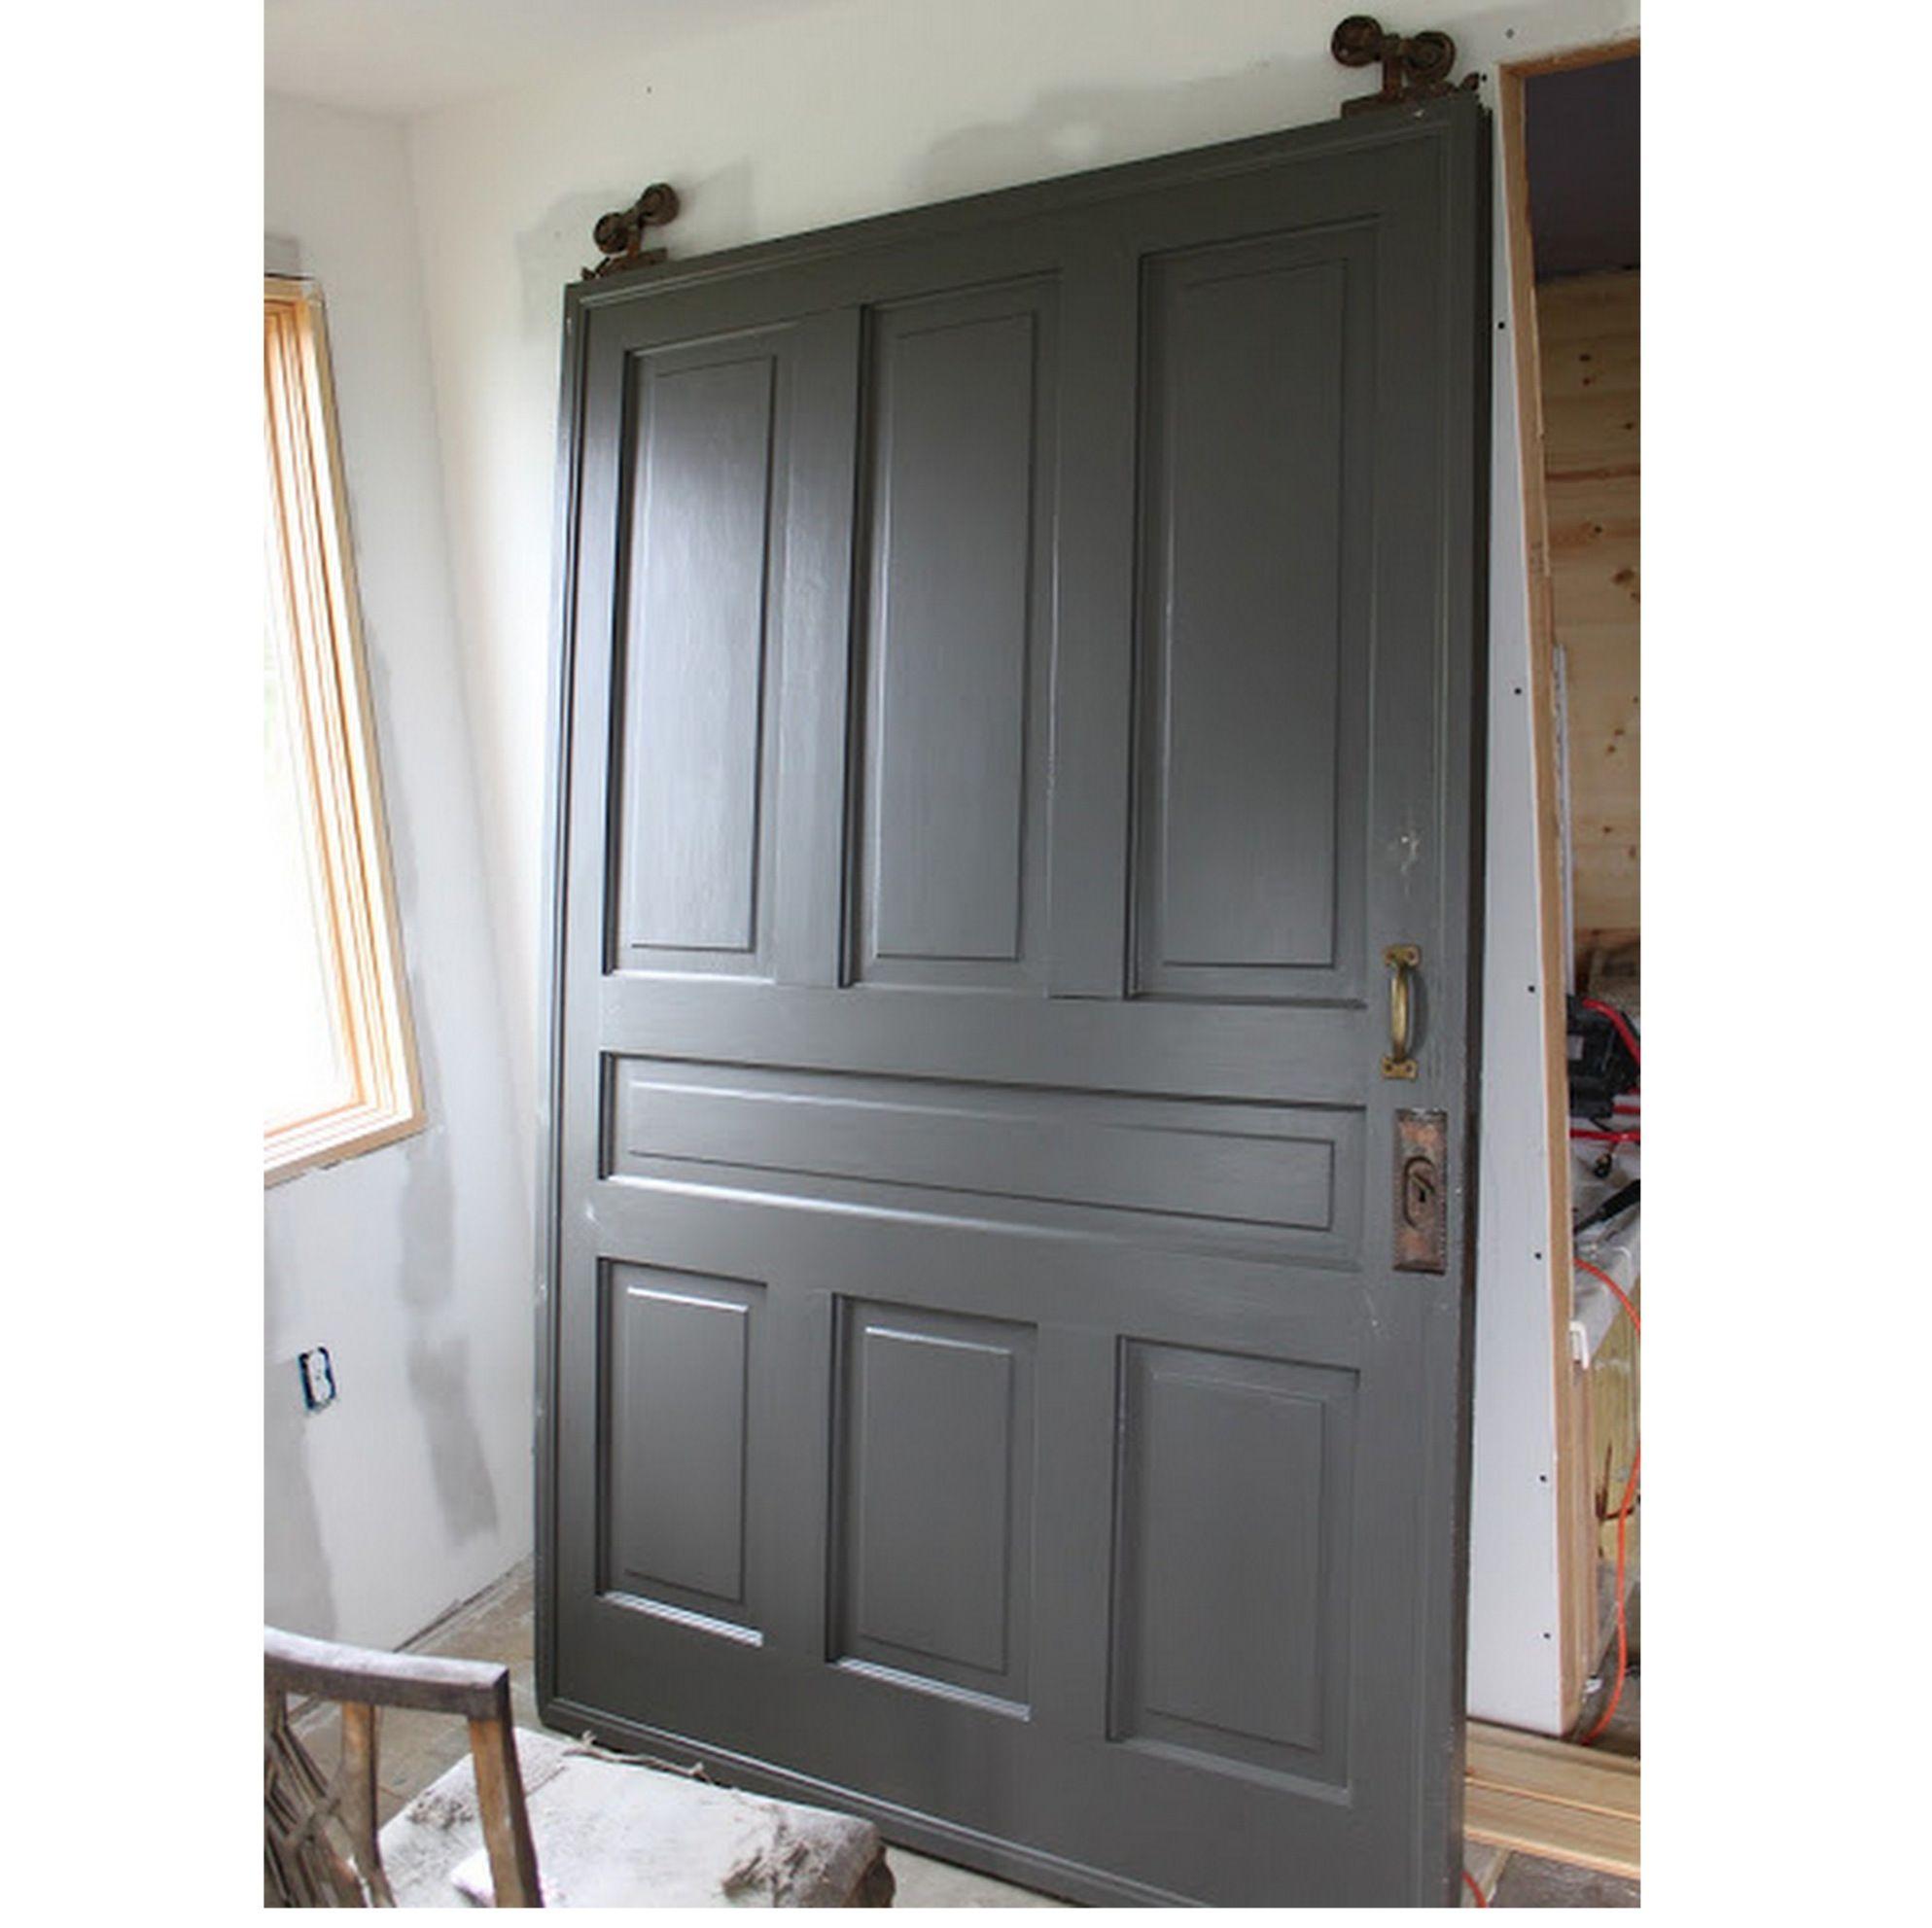 Most Popular Benjamin Moore Paint Colors Interior Door Colors Paint Colors Benjamin Moore Doors Interior